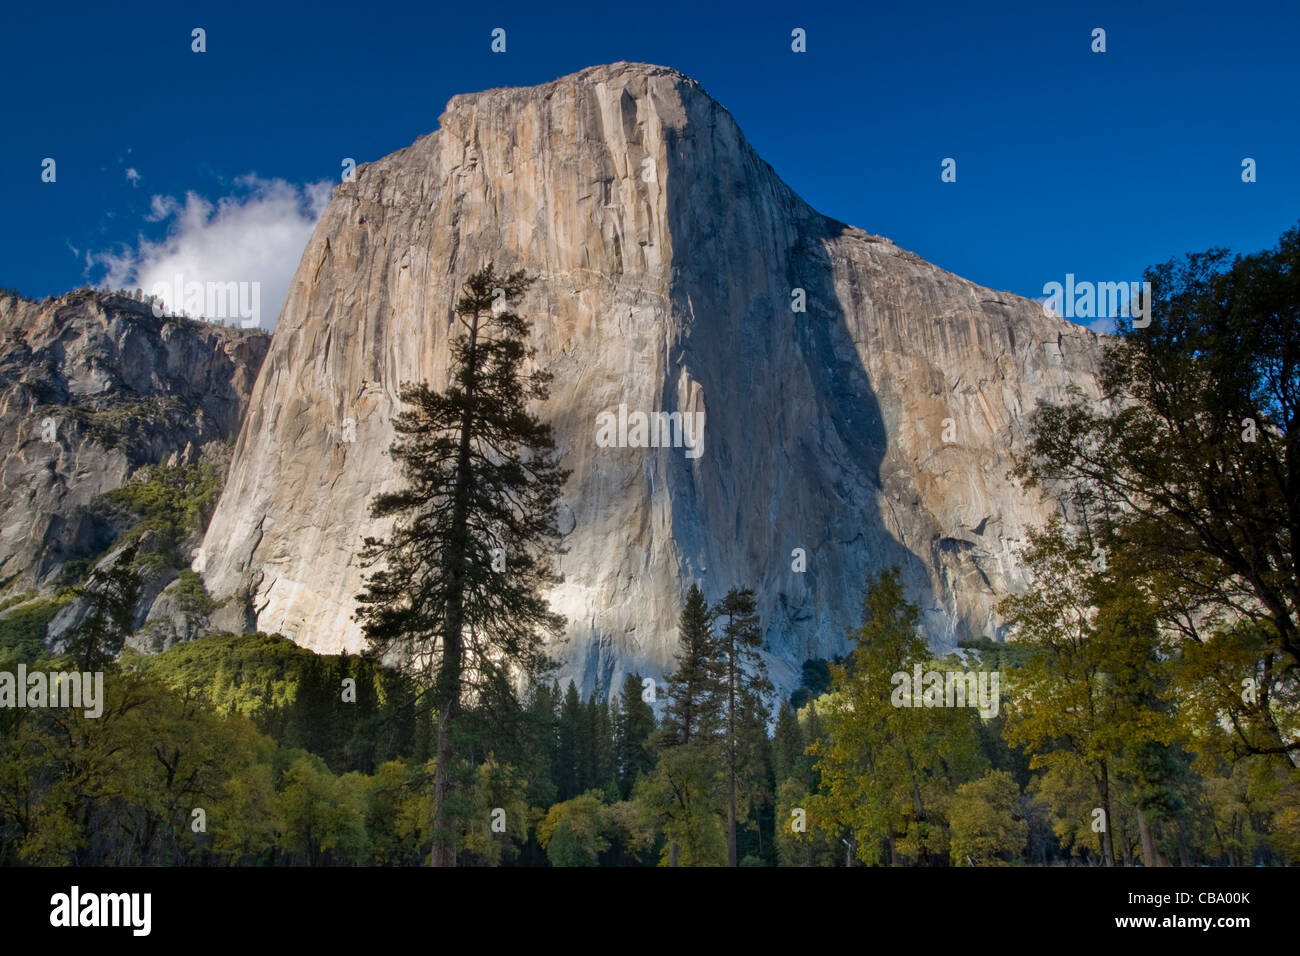 El Capitan - Yosemite National Park, California. Stock Photo